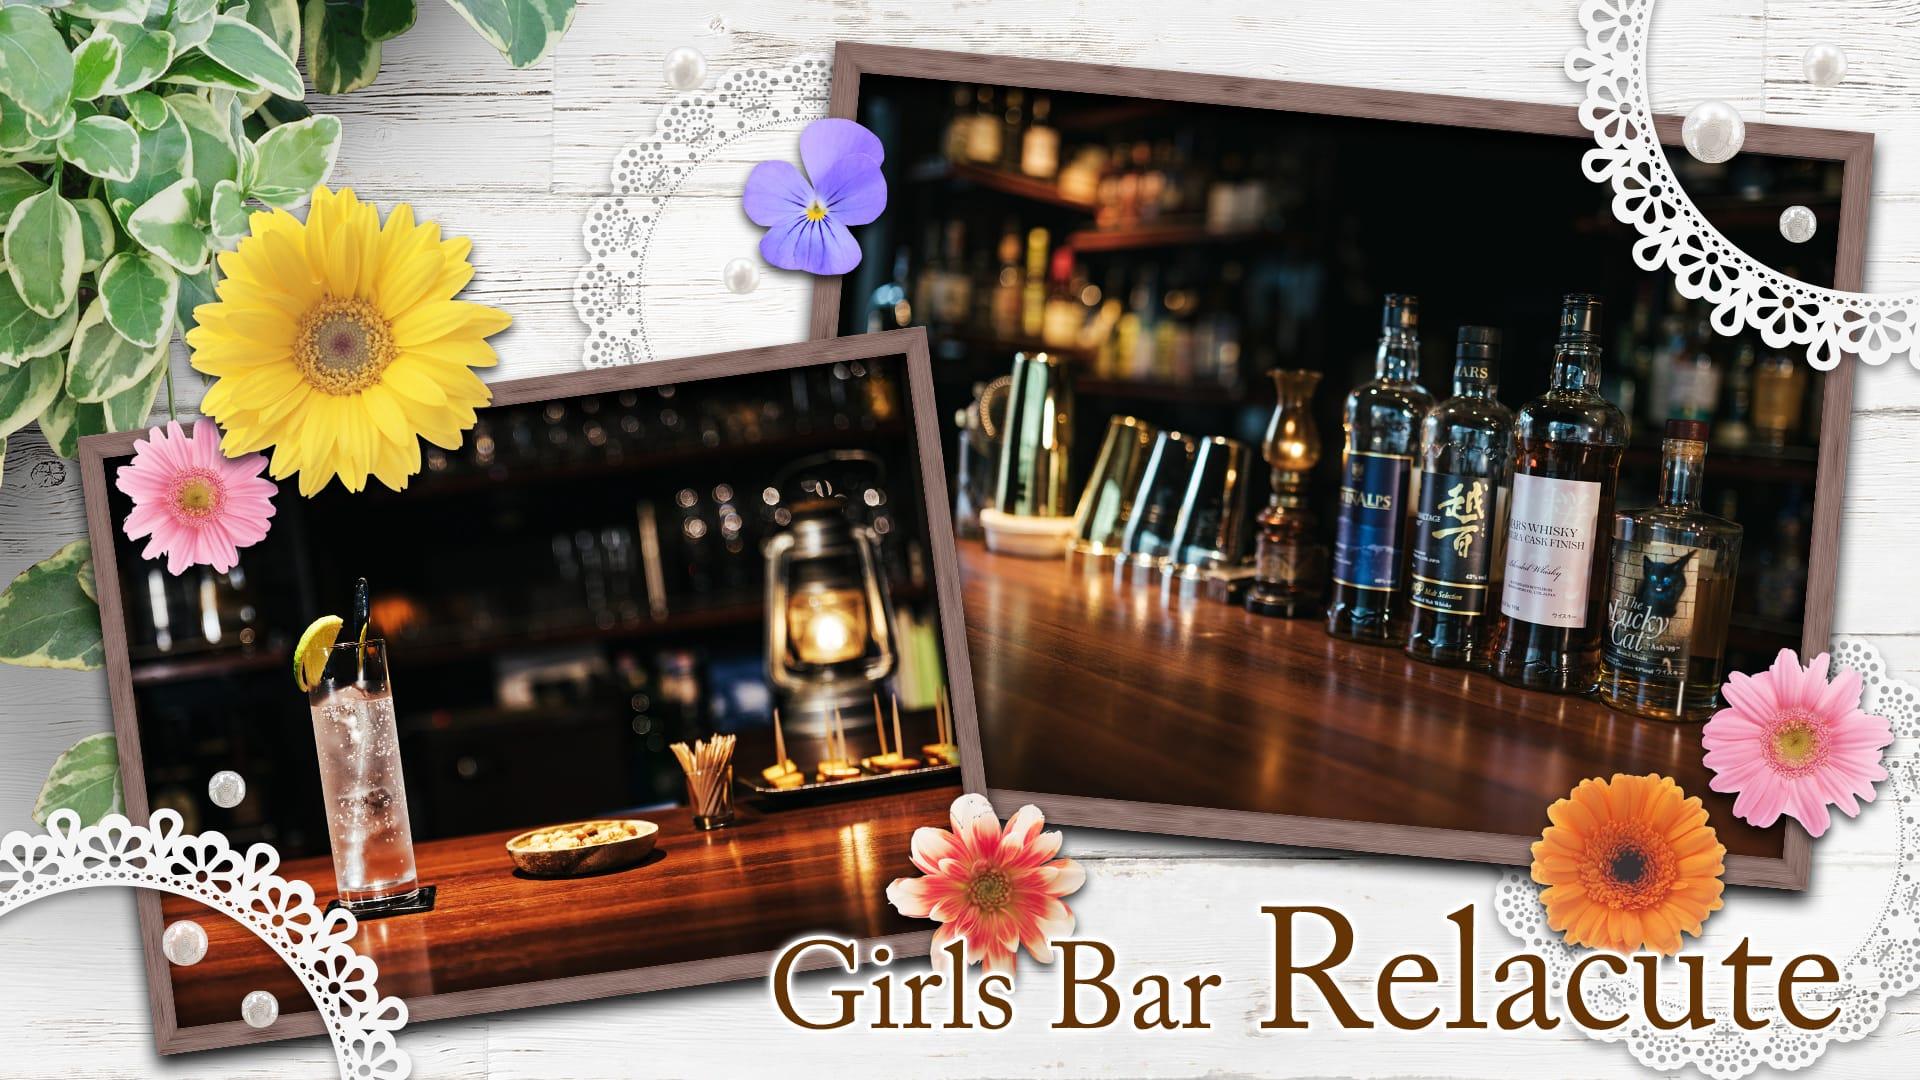 Girls Bar リラキュート 目黒ガールズバー TOP画像